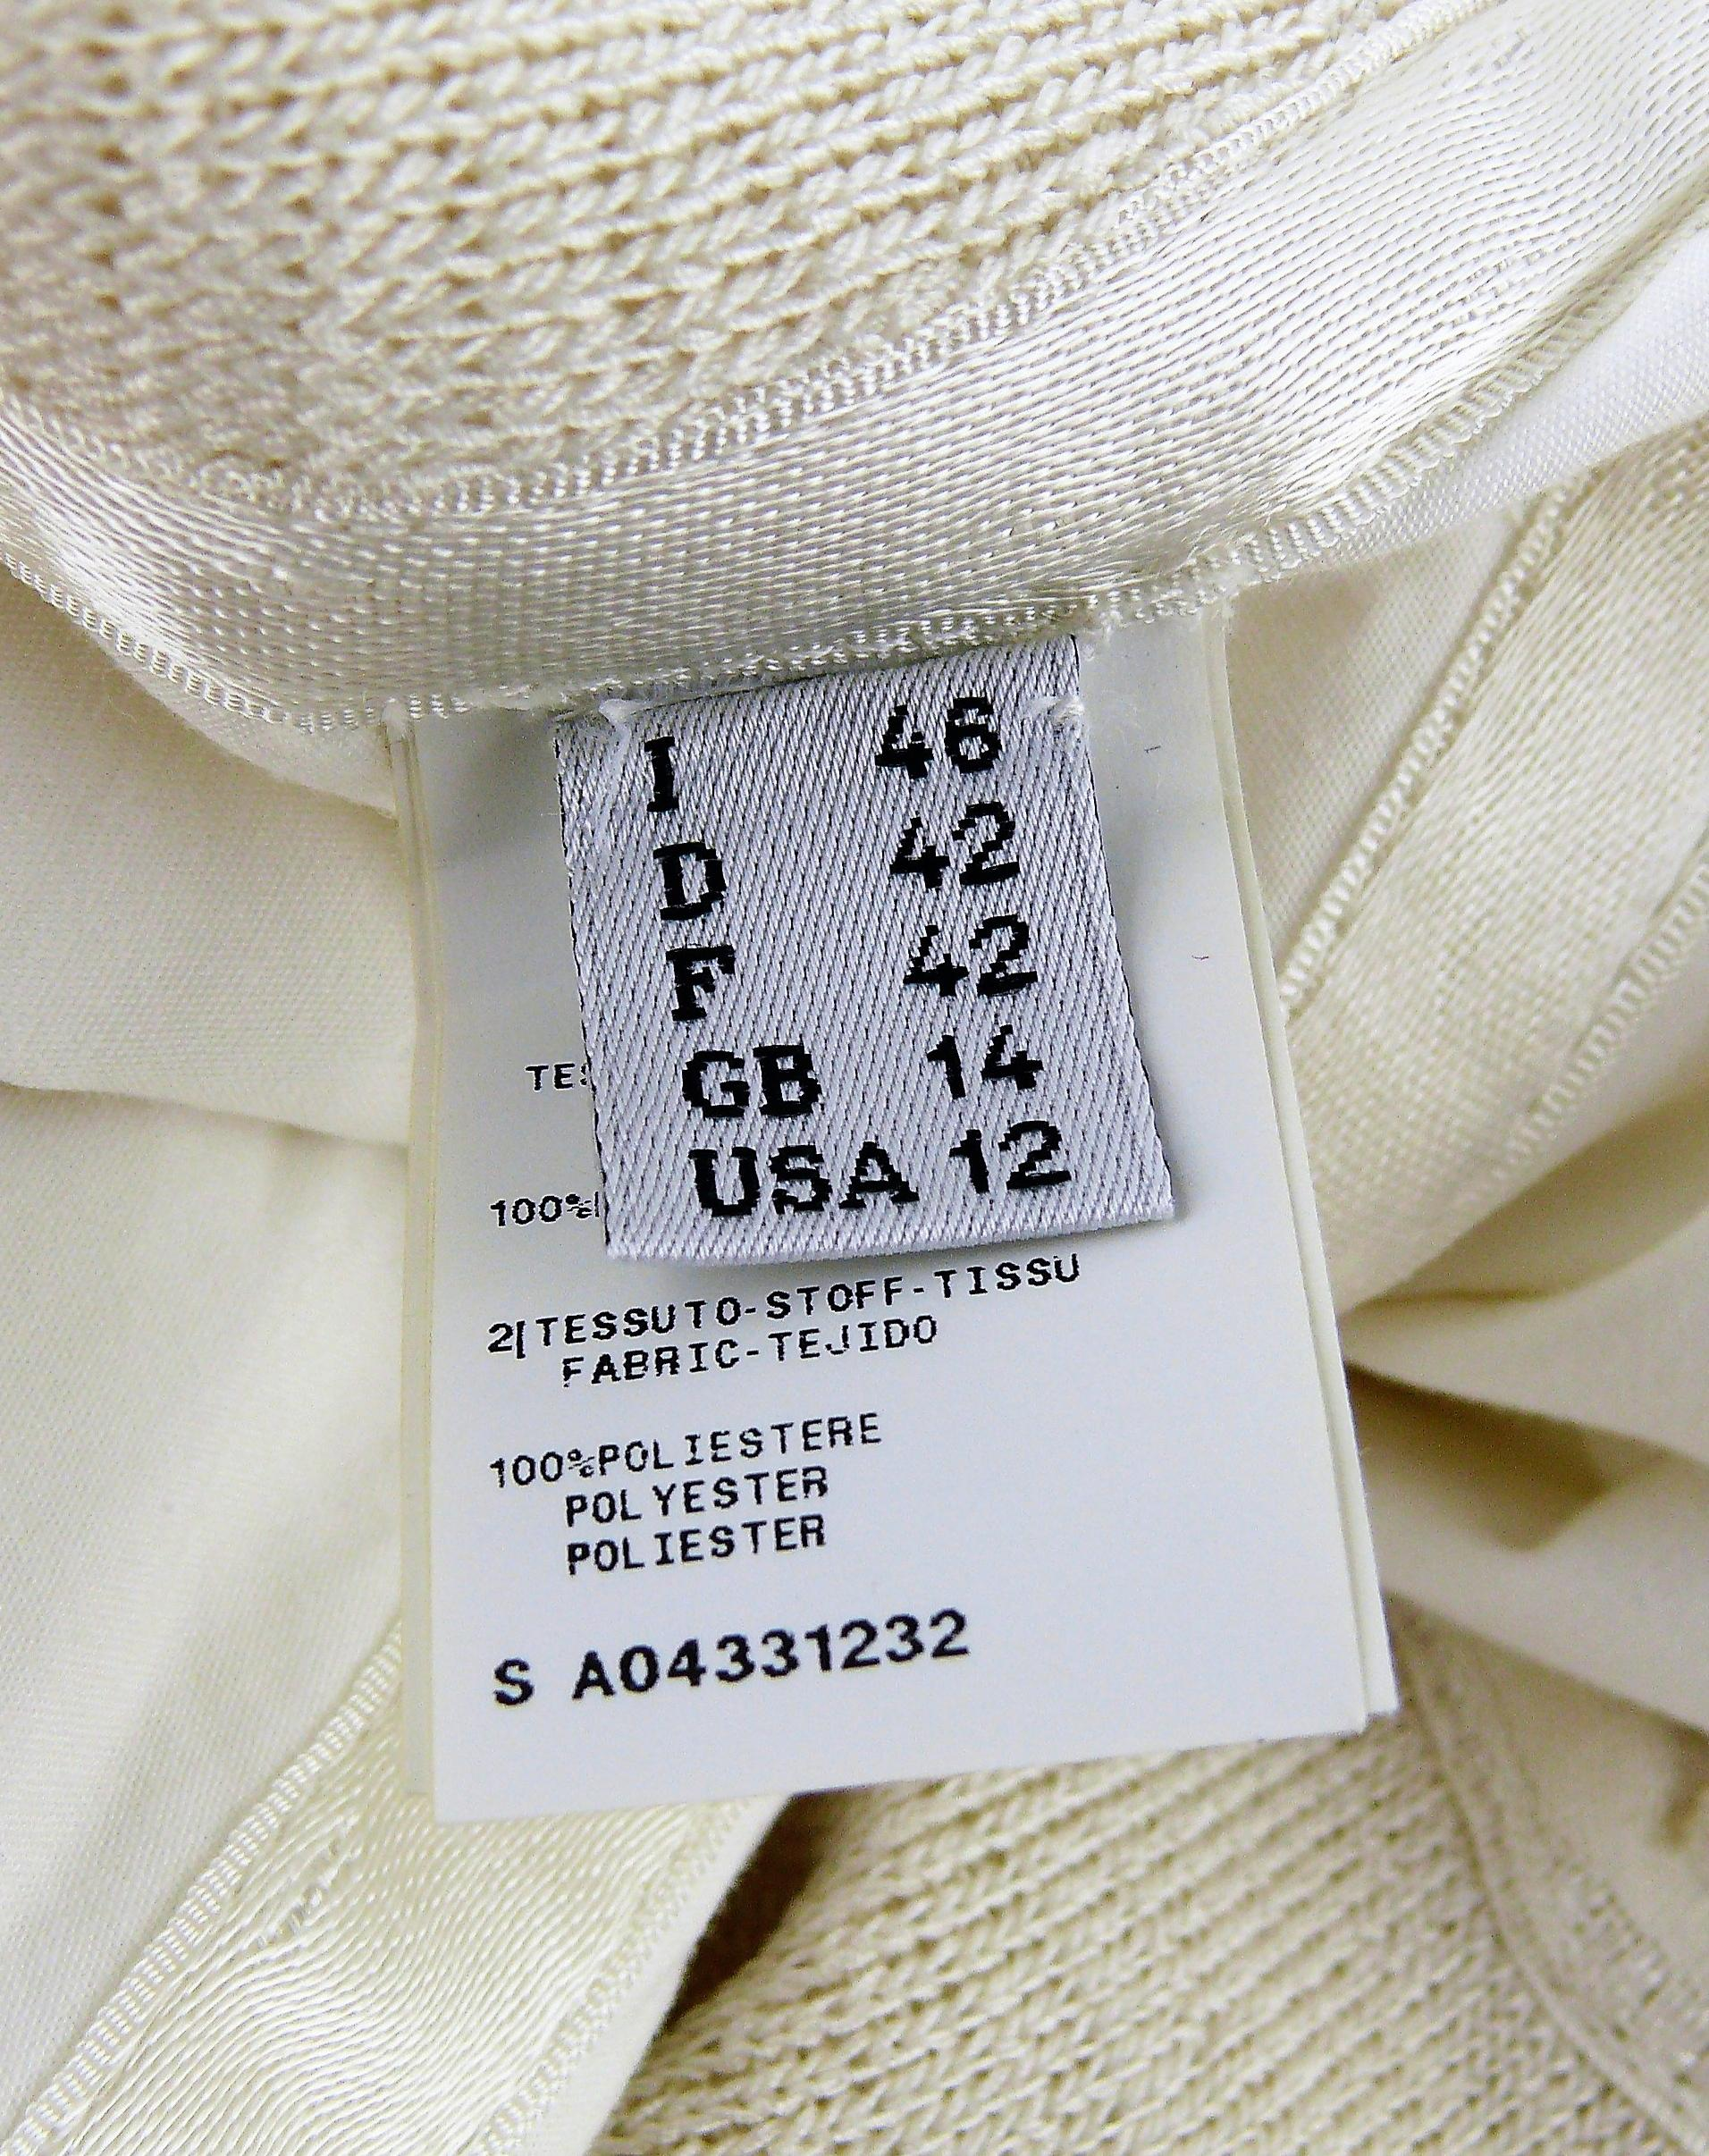 Tissu Jean Paul Gaultier jean paul gaultier corset lace bra dress us size 12